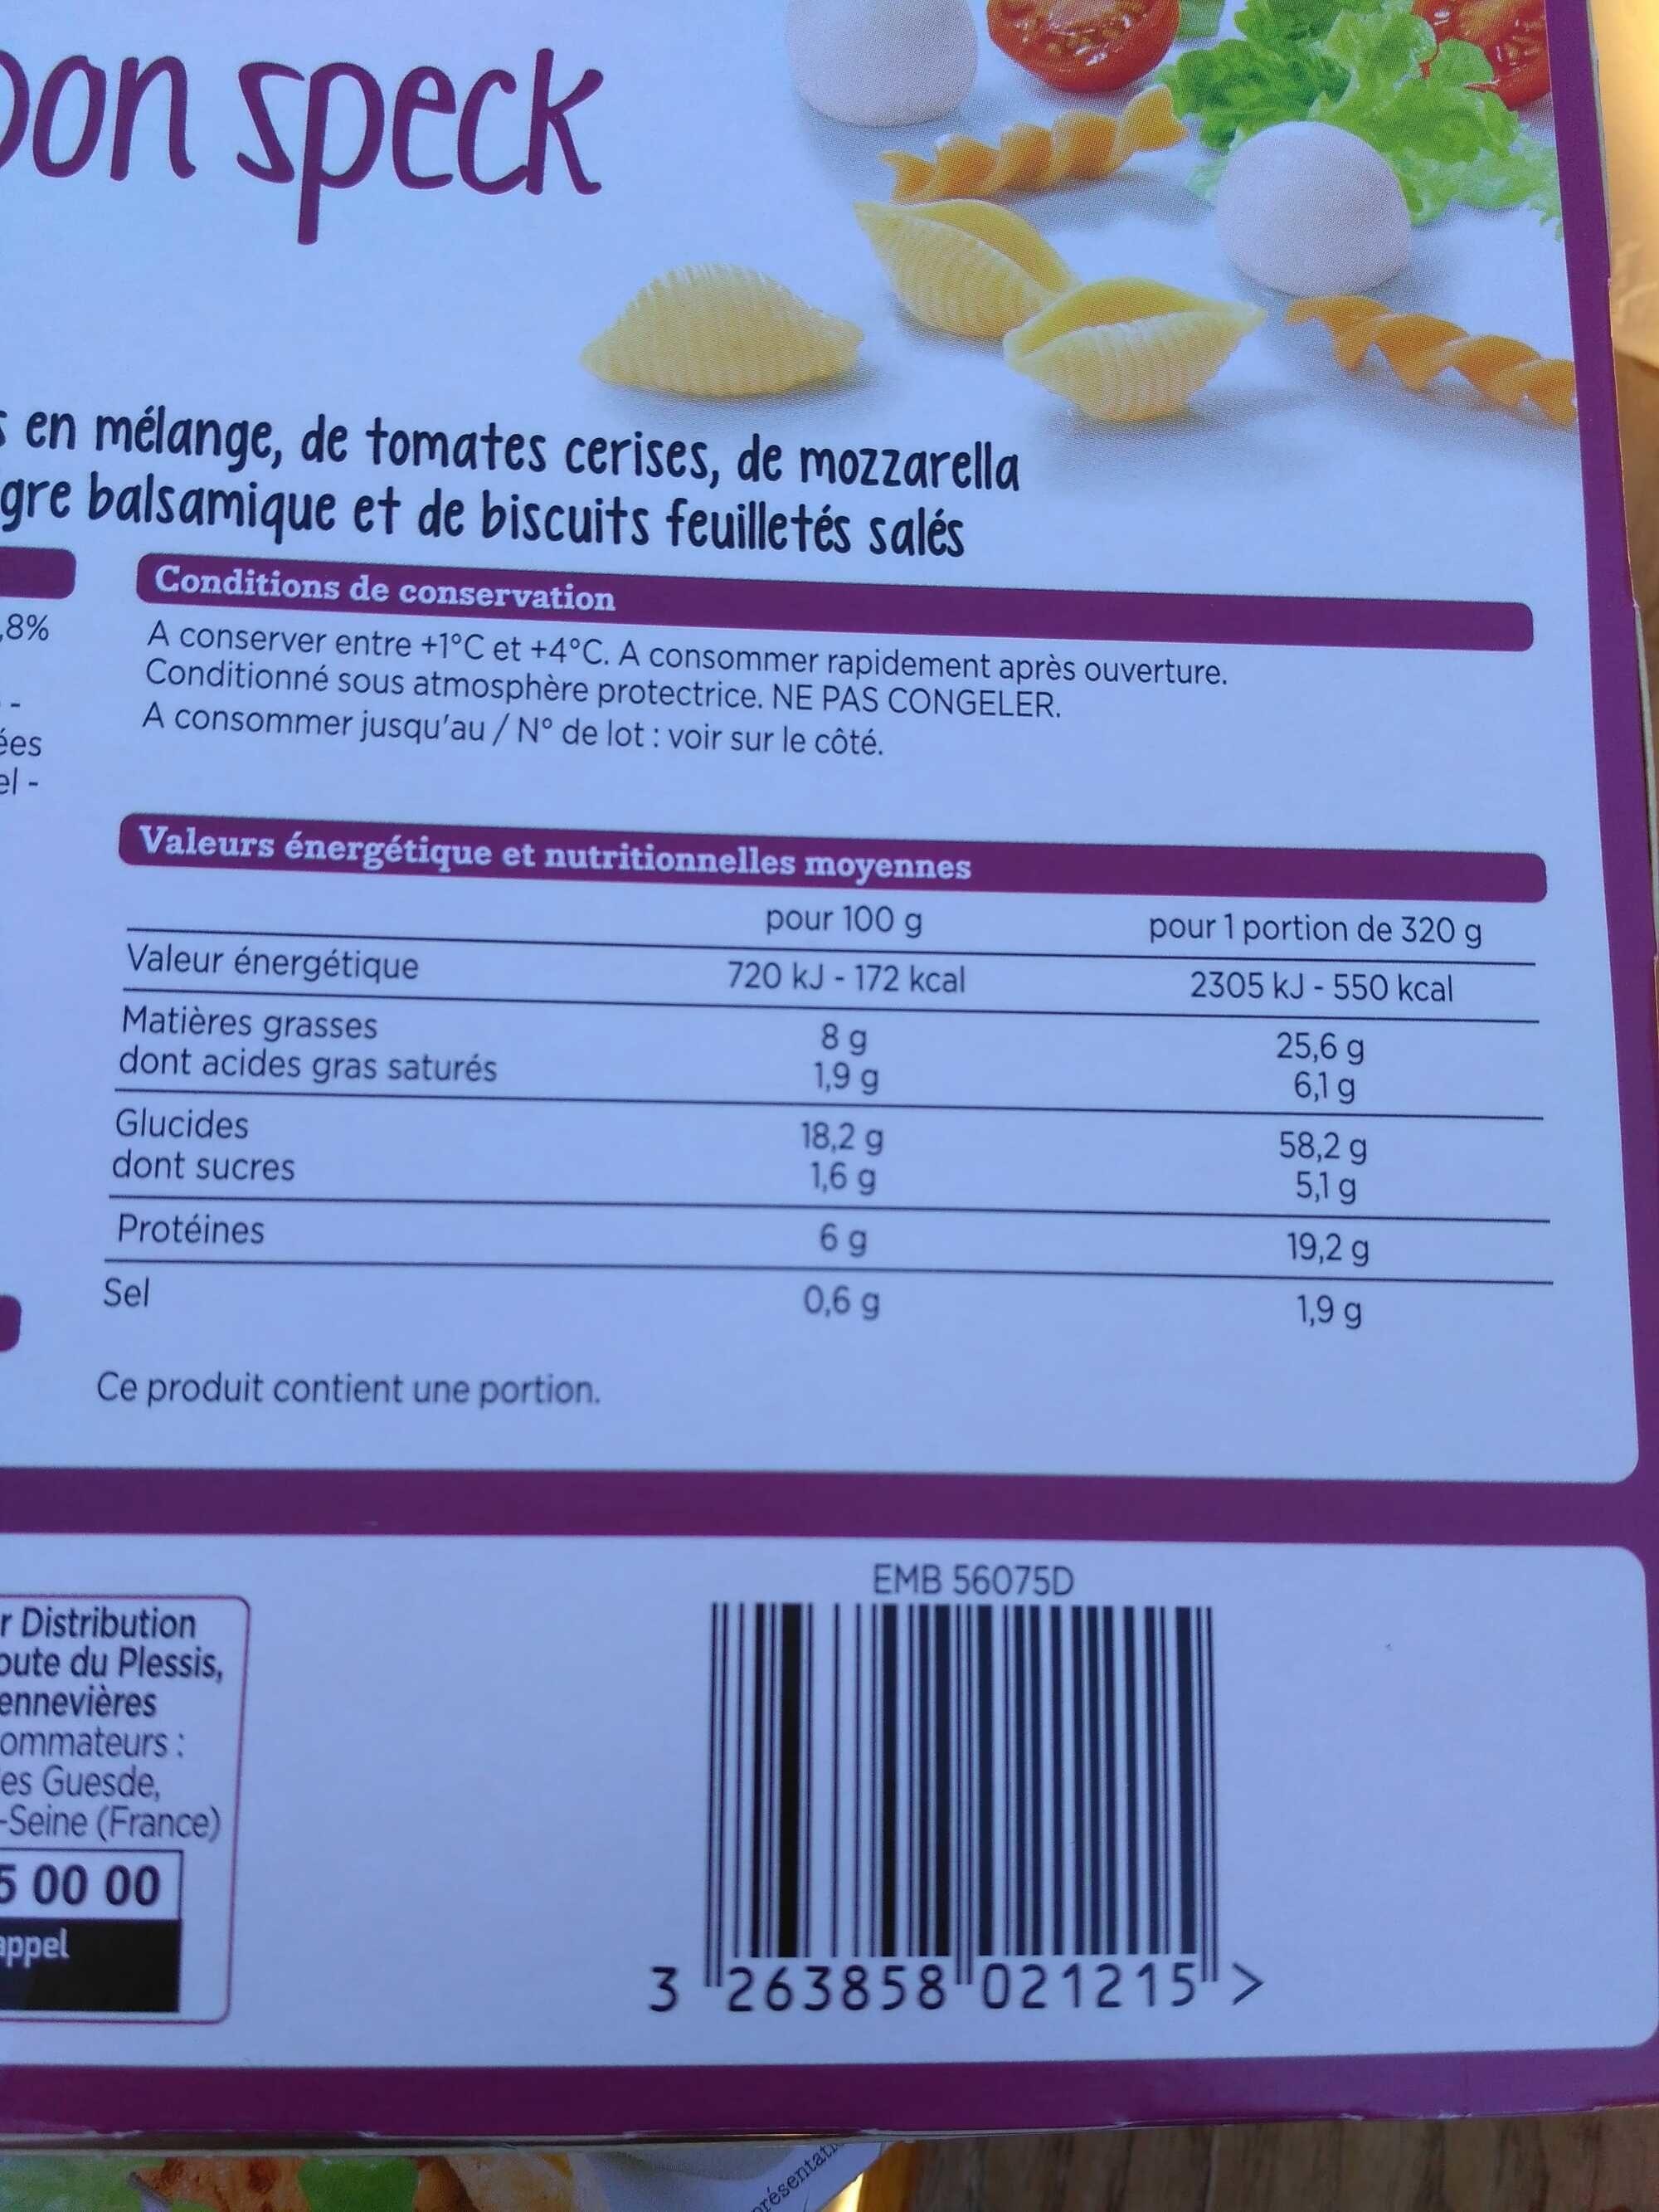 Salade mozzarella, jambon speck - Produit - fr